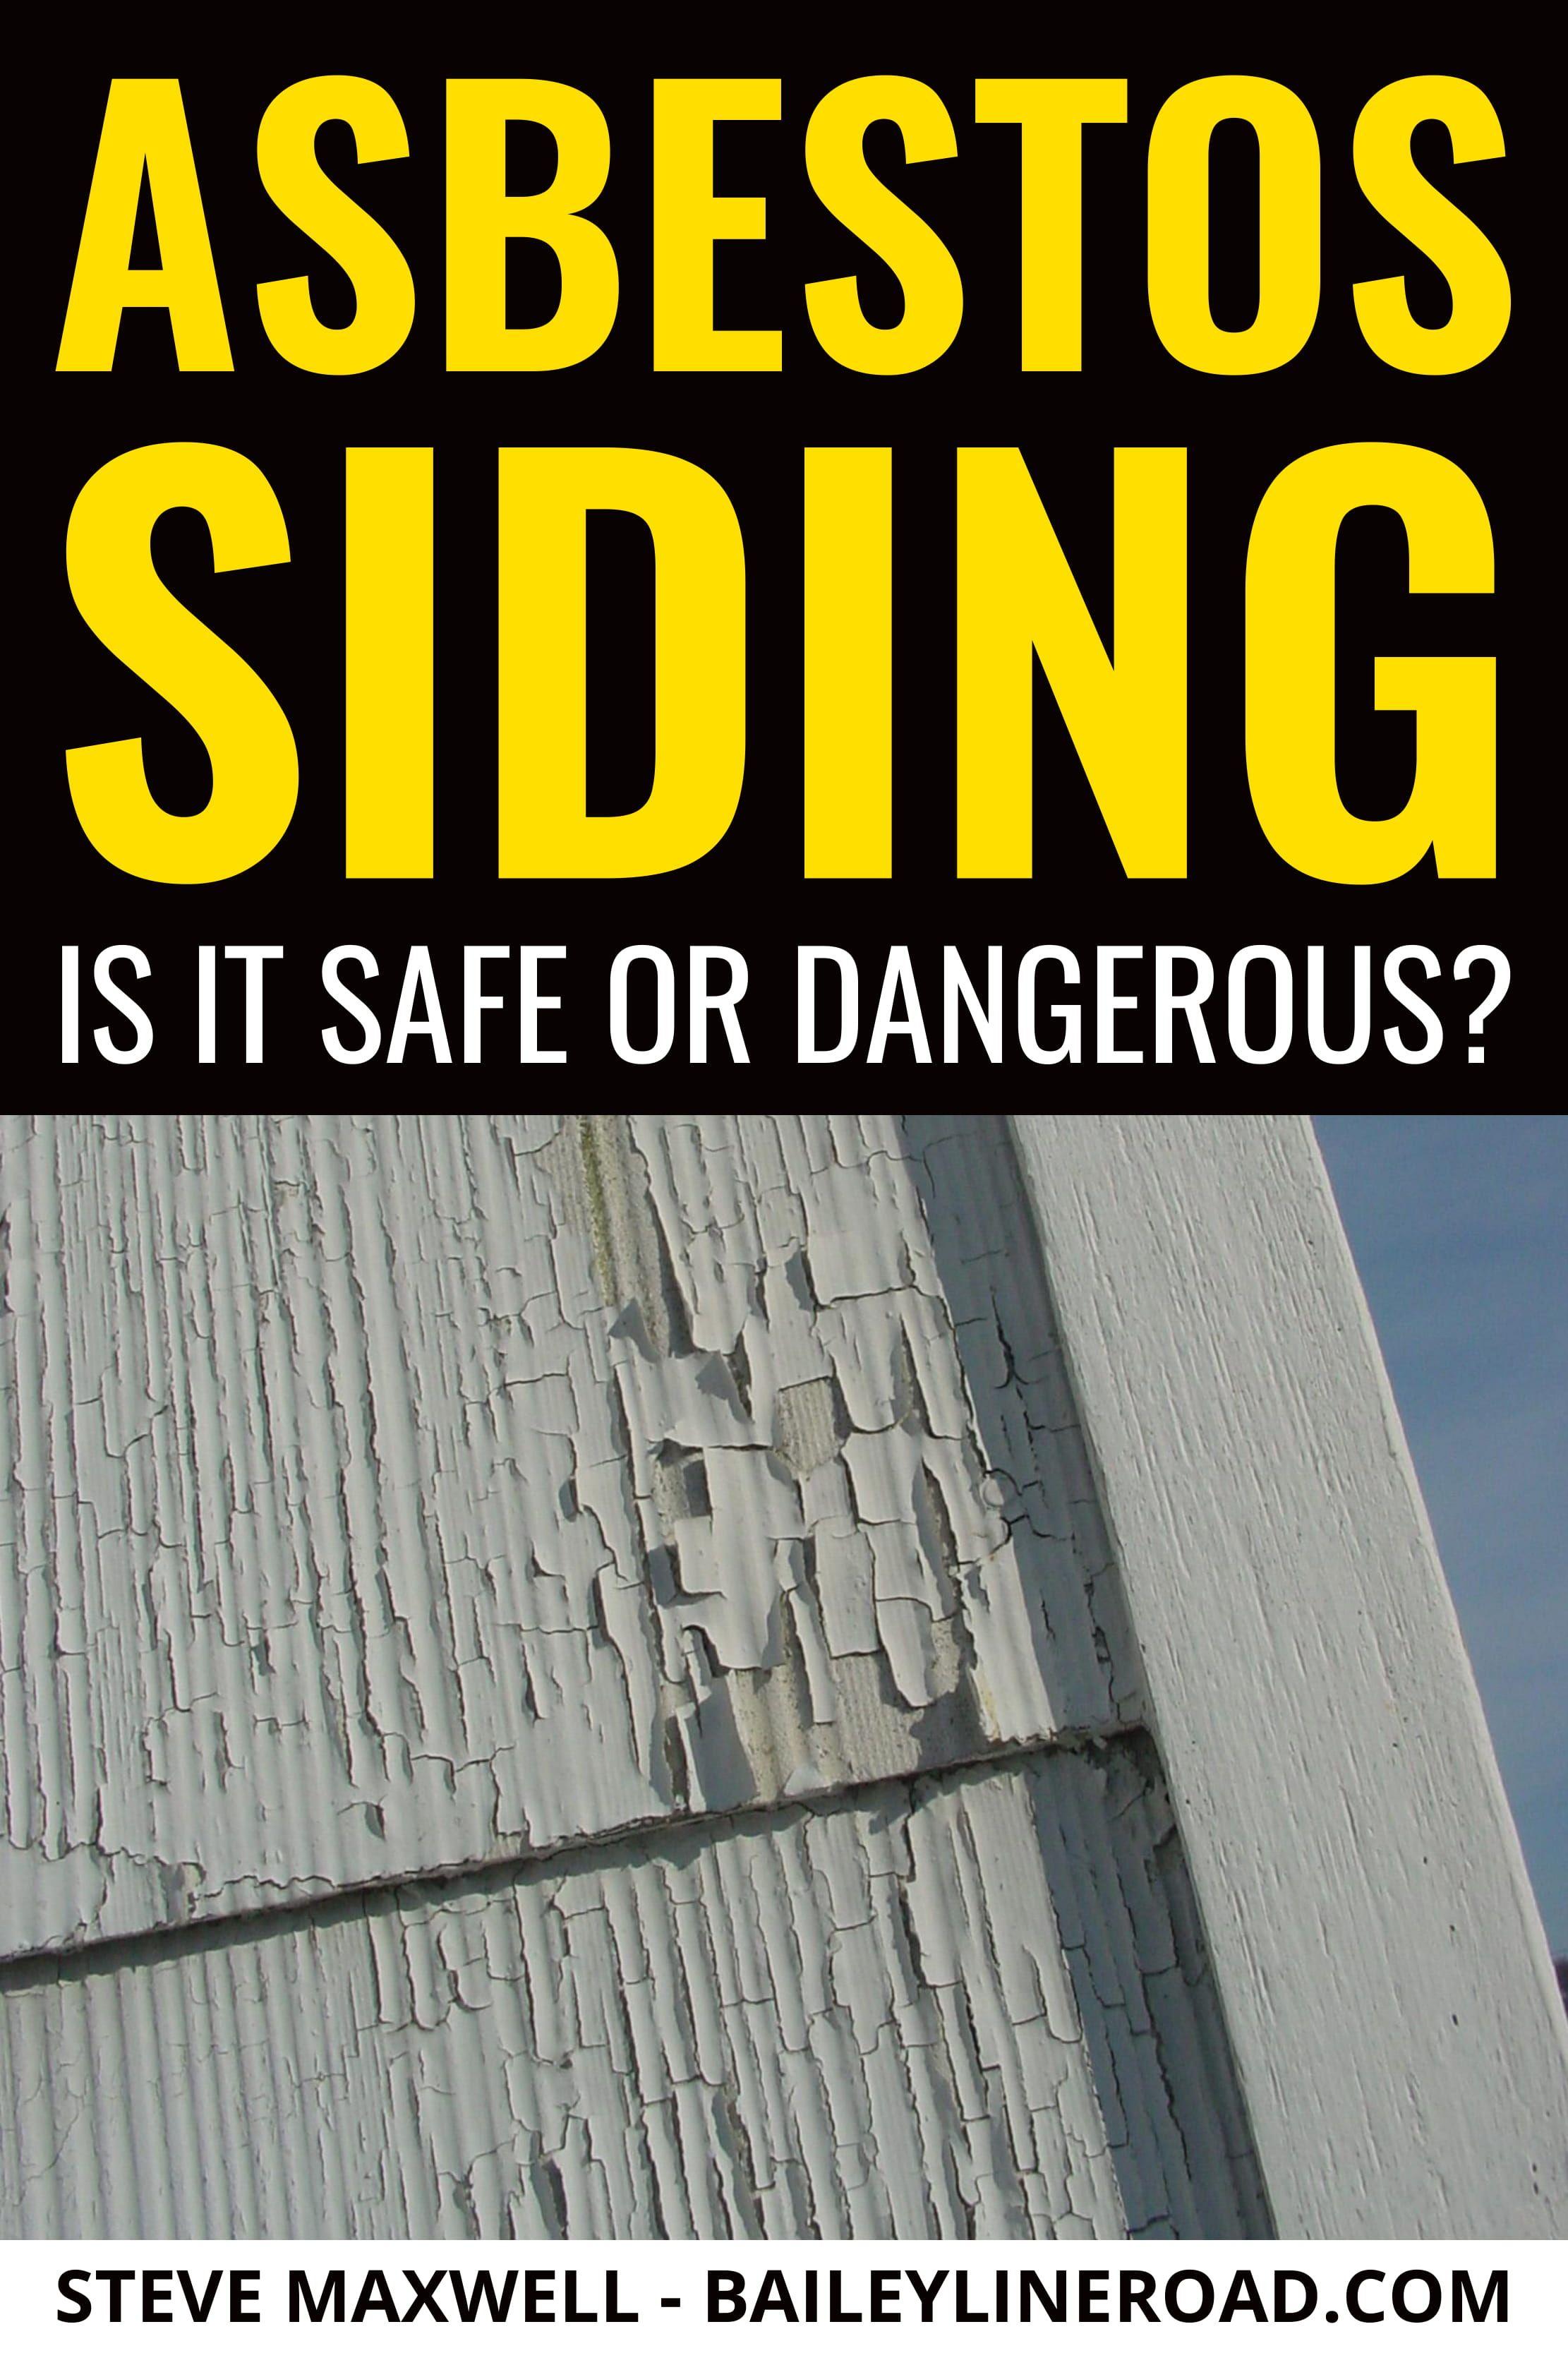 Asbestos Siding Is It Safe Or Dangerous Baileylineroad In 2020 Asbestos Siding Siding Siding Removal